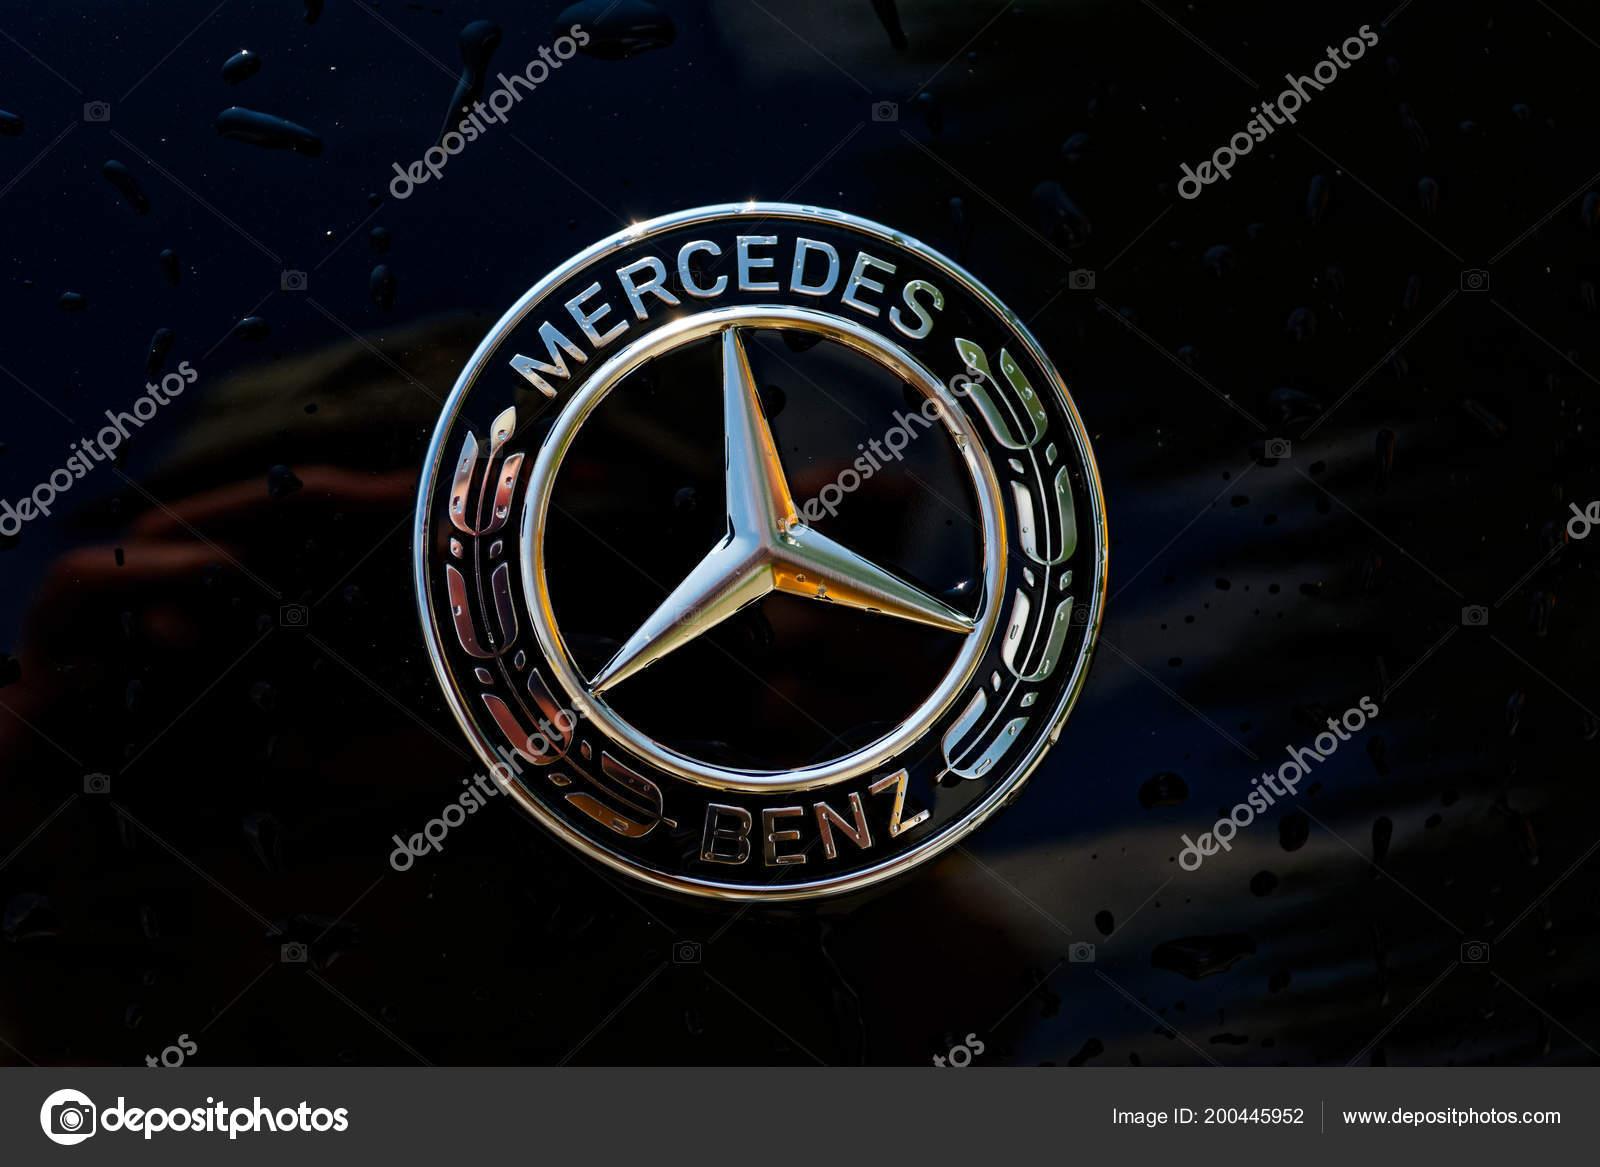 Kiev Juni Mercedes Benz Teken Close Juni 2018 Kiev Oekraine